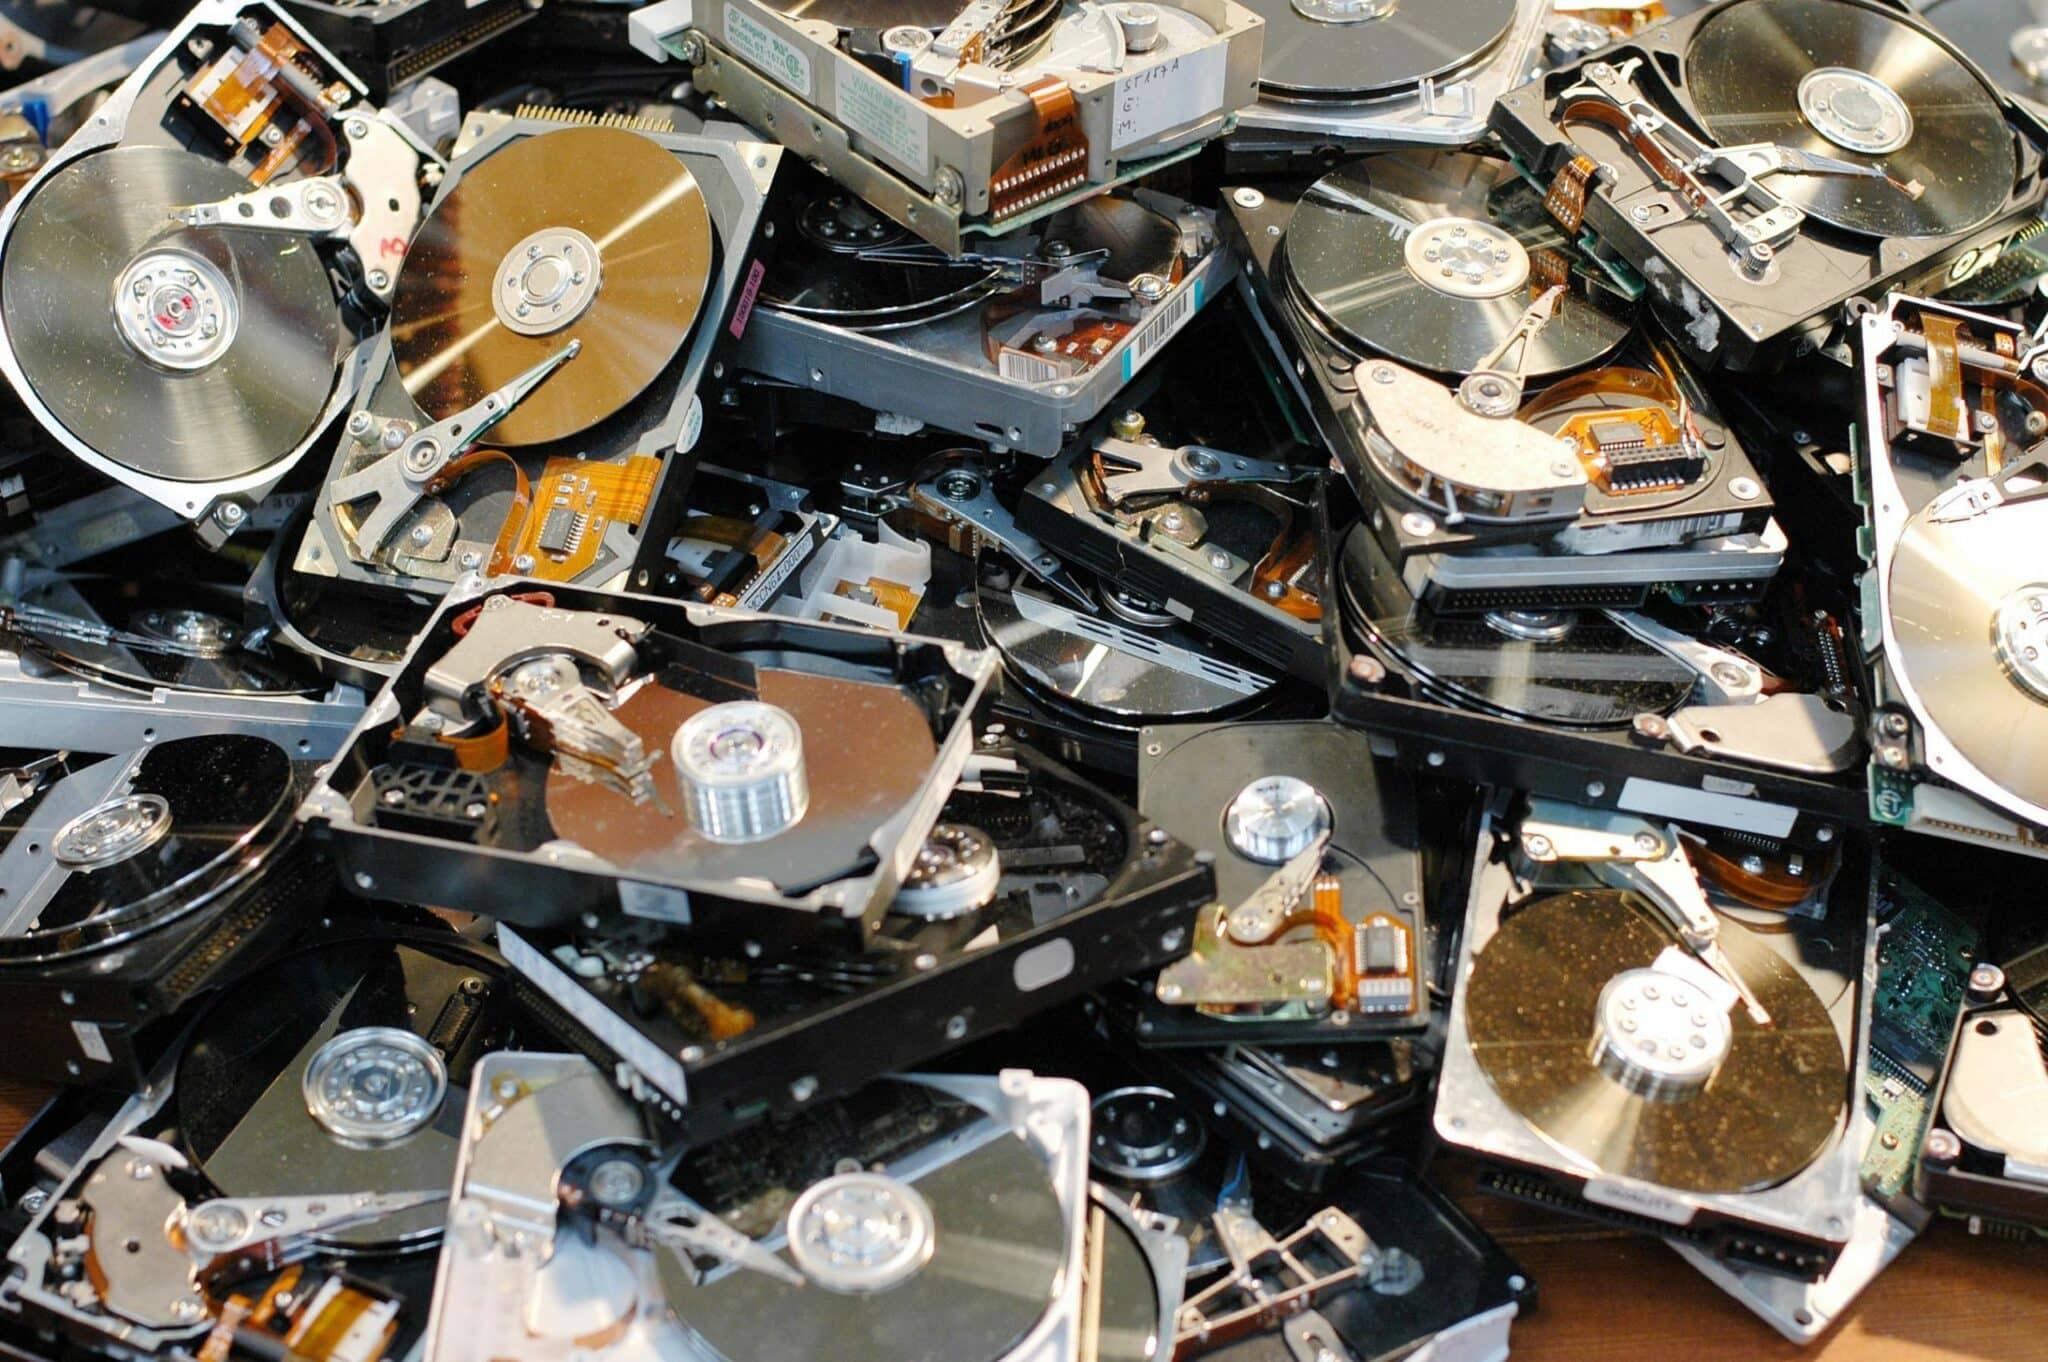 Pile of broken hard drives